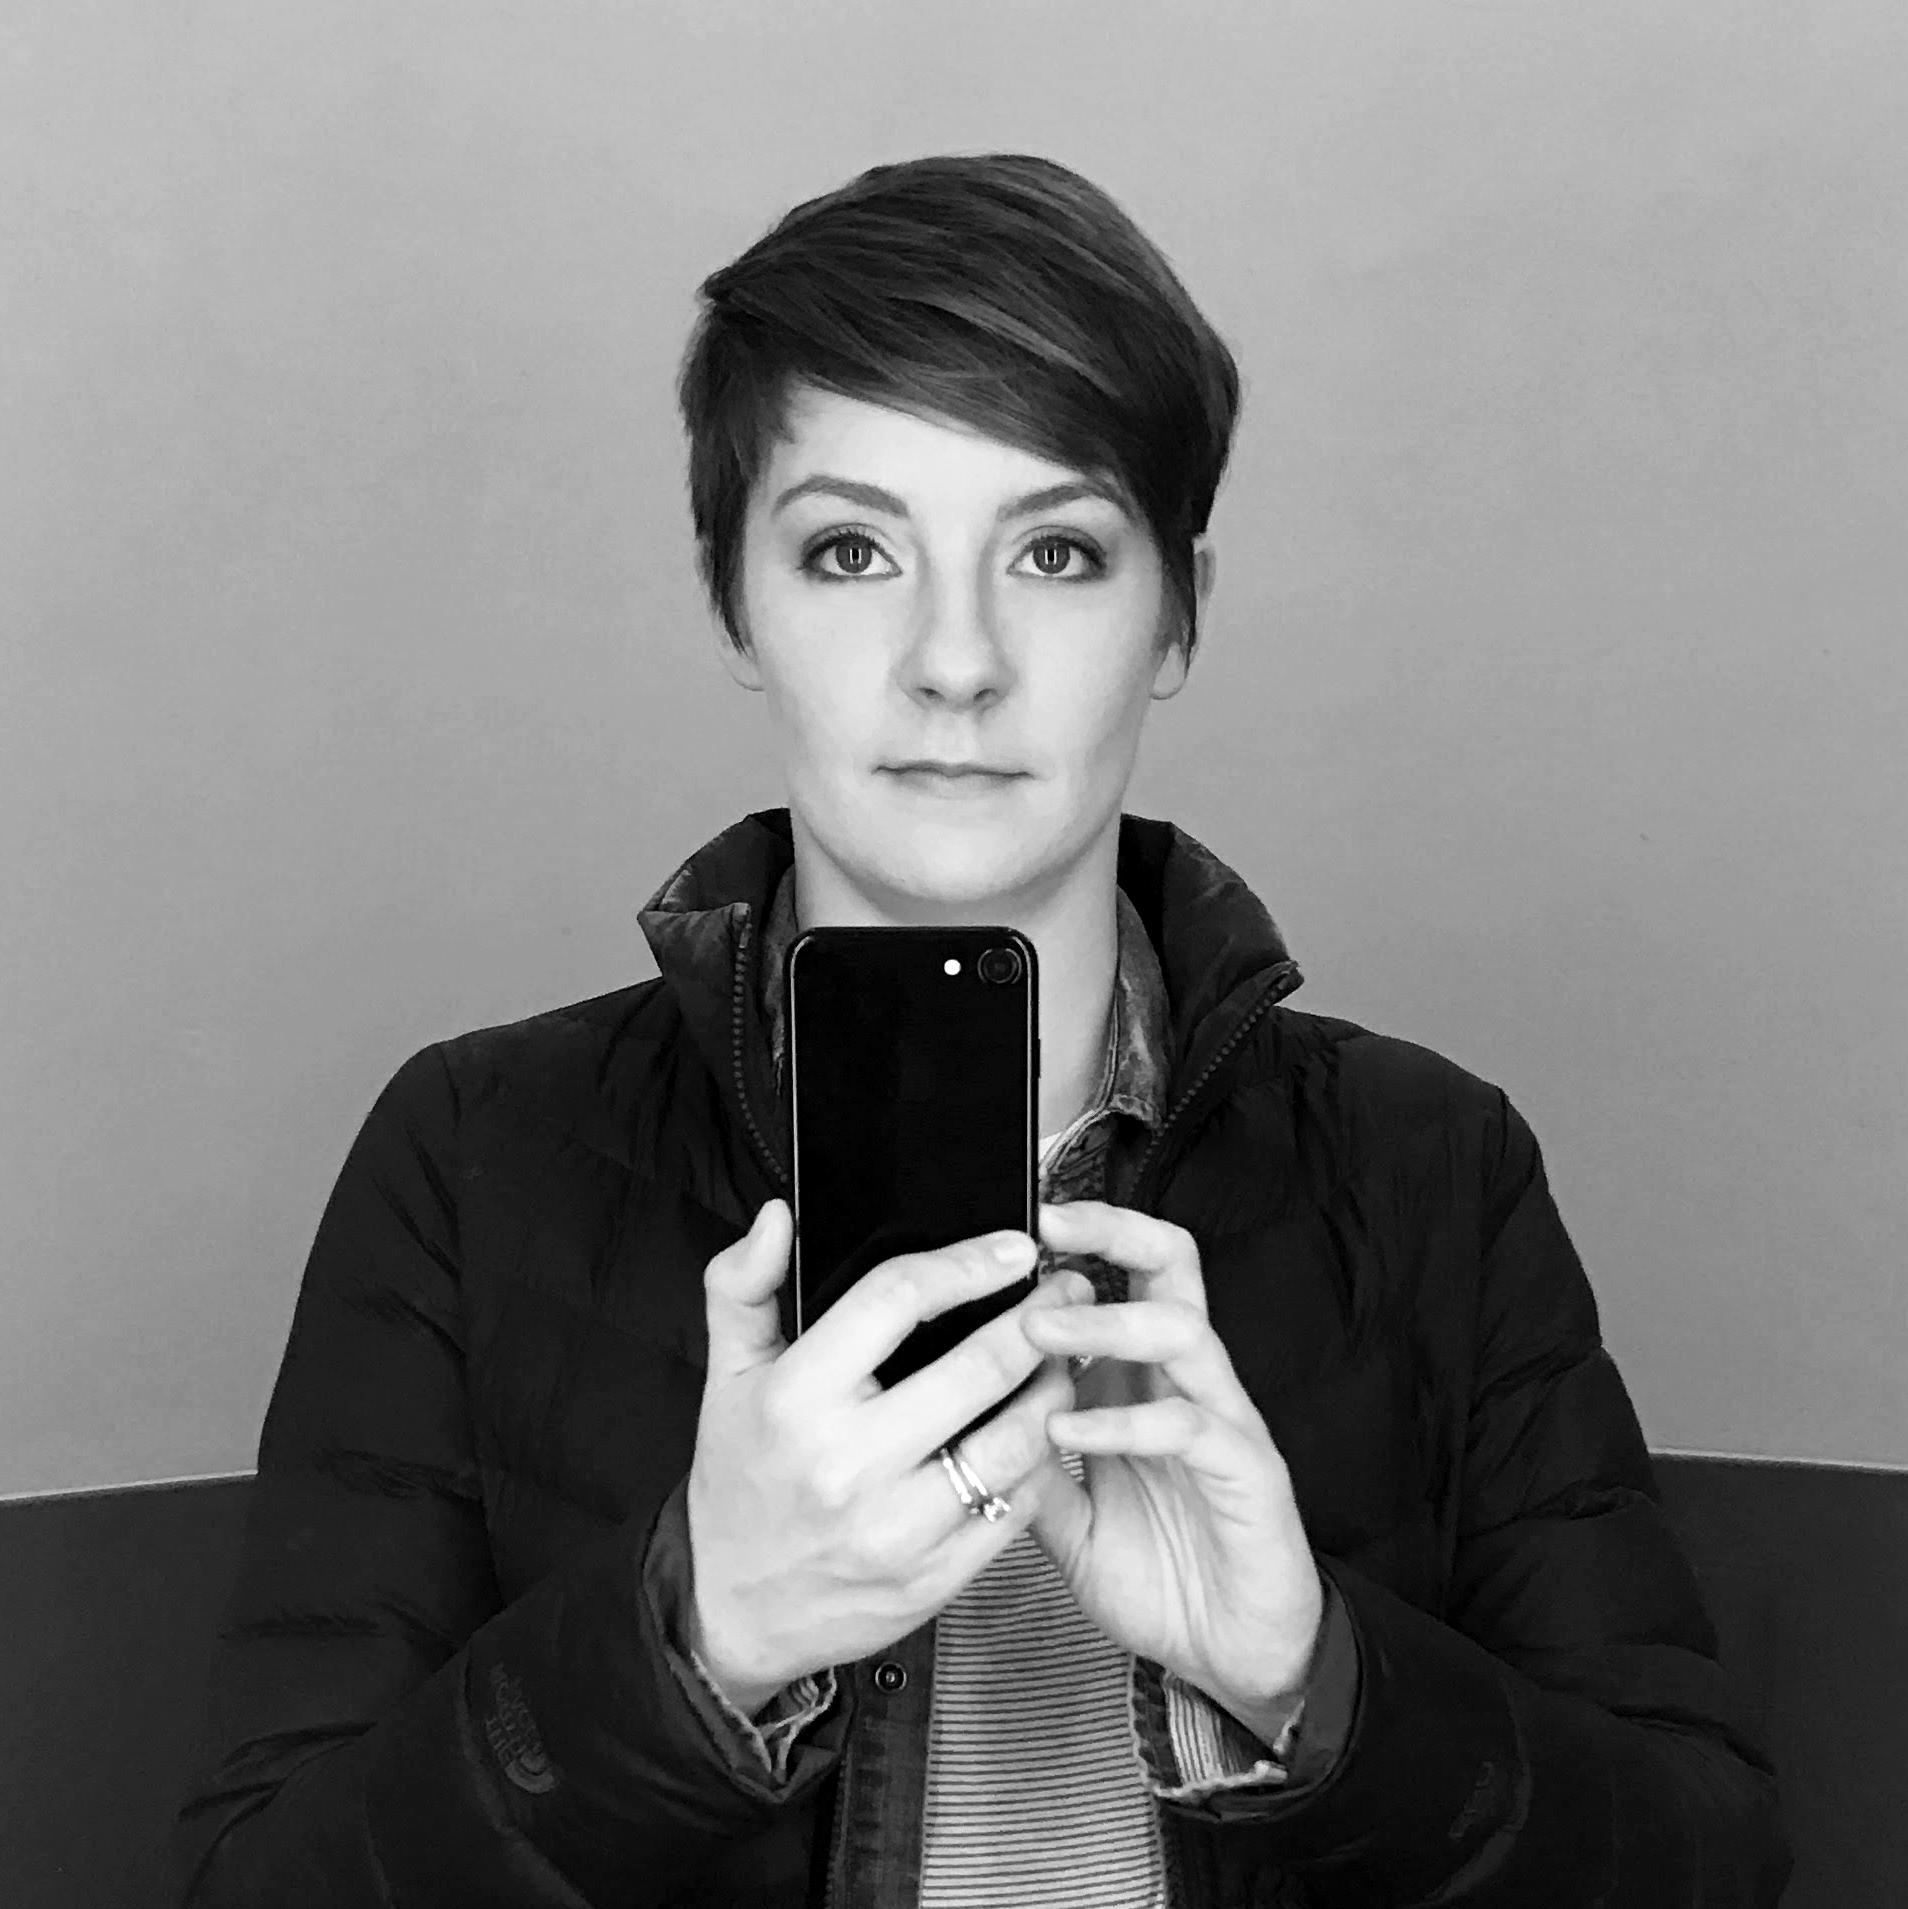 Bethany_Headshot2017.jpg